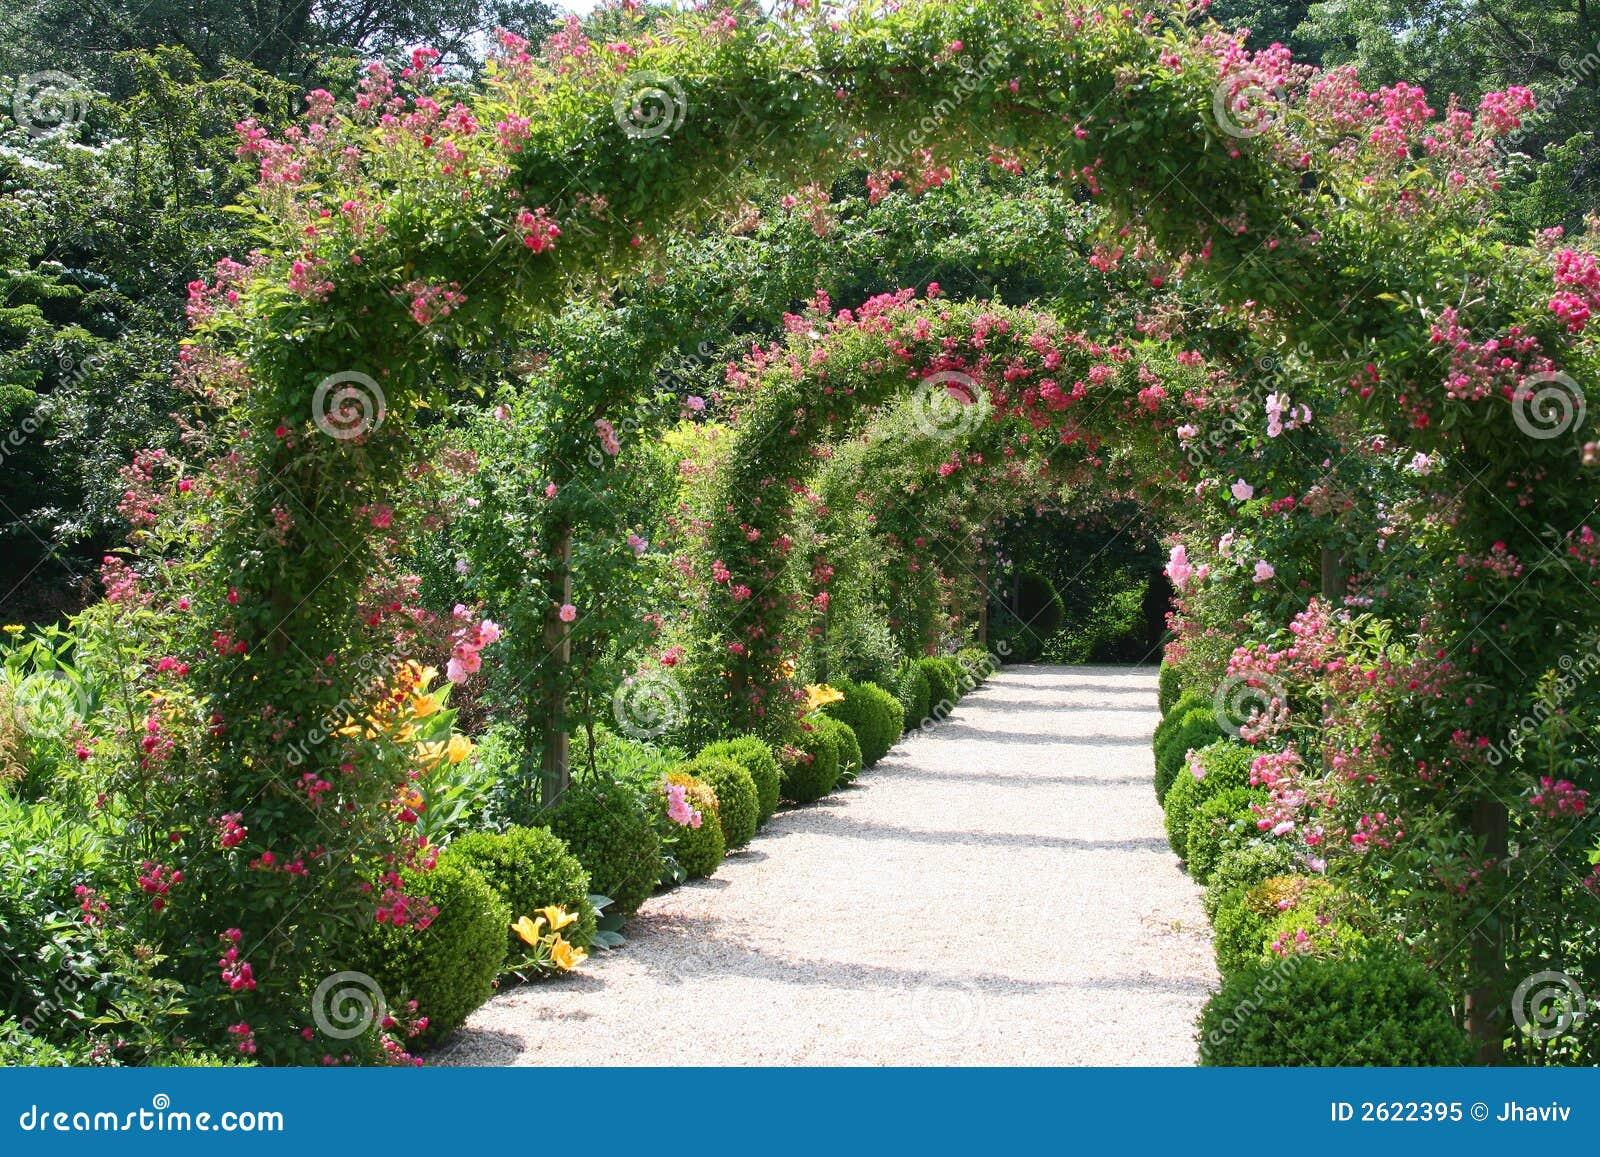 imagens jardim de rosas:Rose Garden Landscape